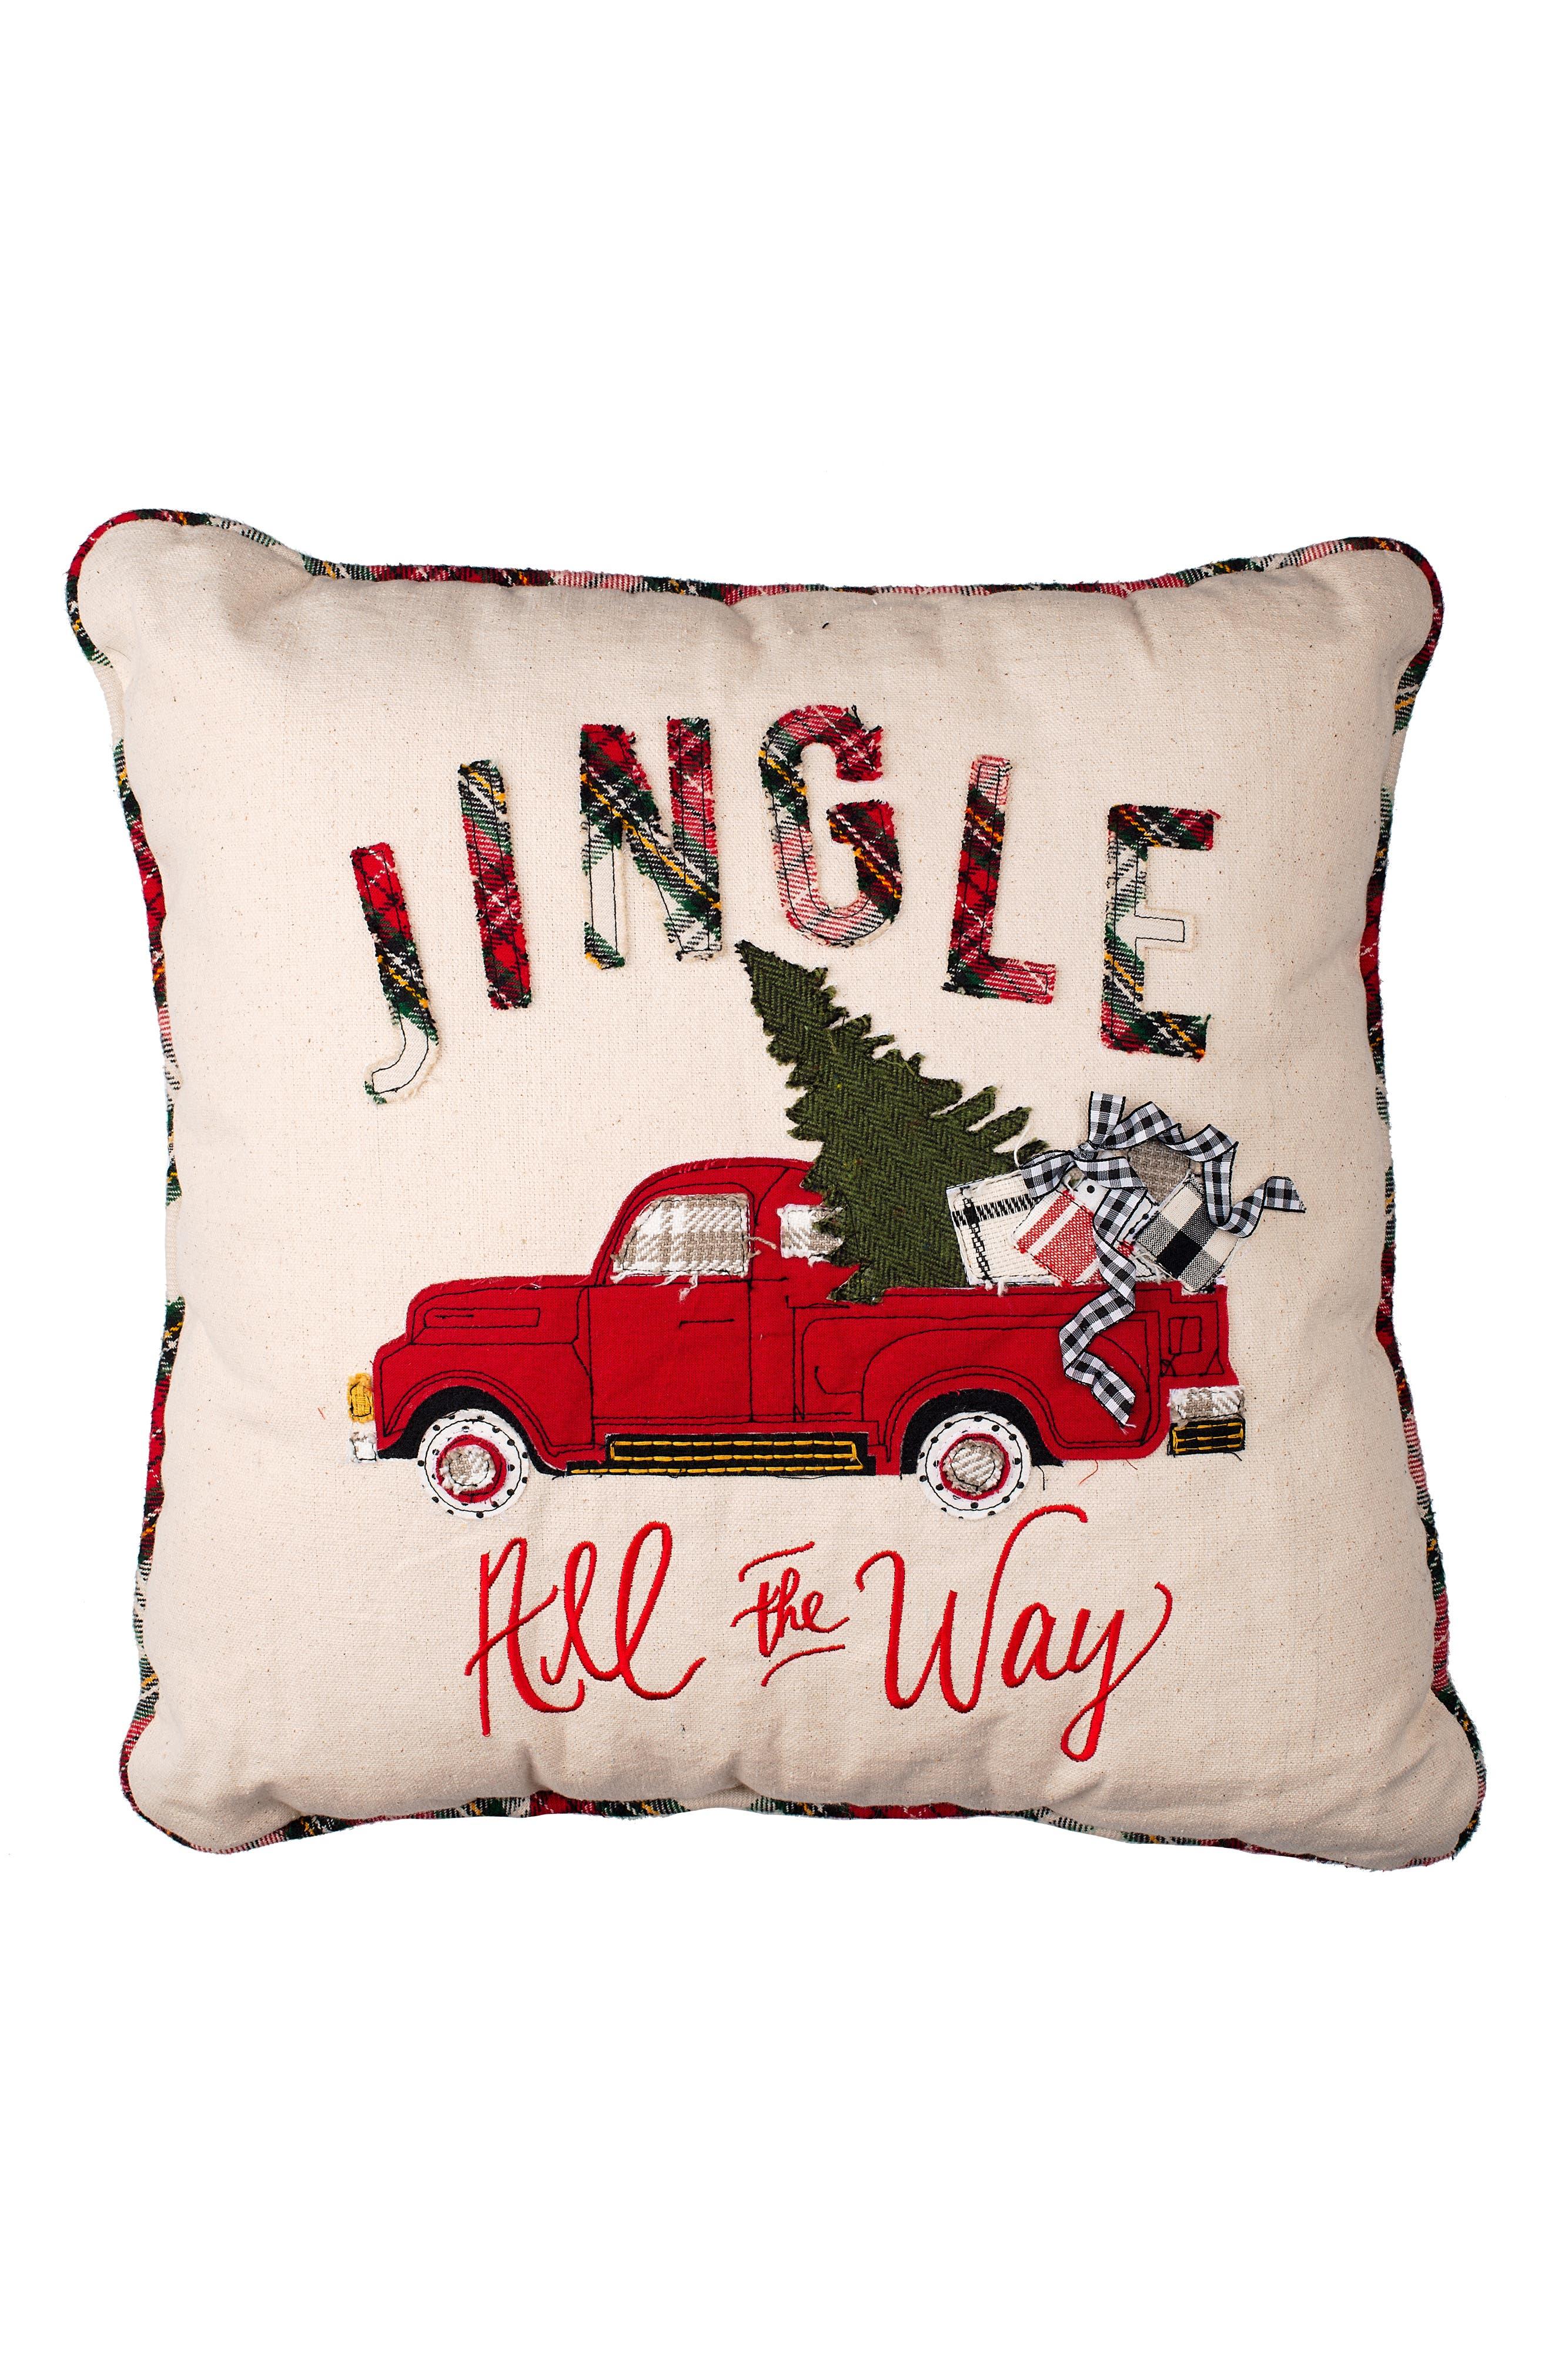 GLORY HAUS,                             Jingle All the Way Pillow,                             Main thumbnail 1, color,                             100